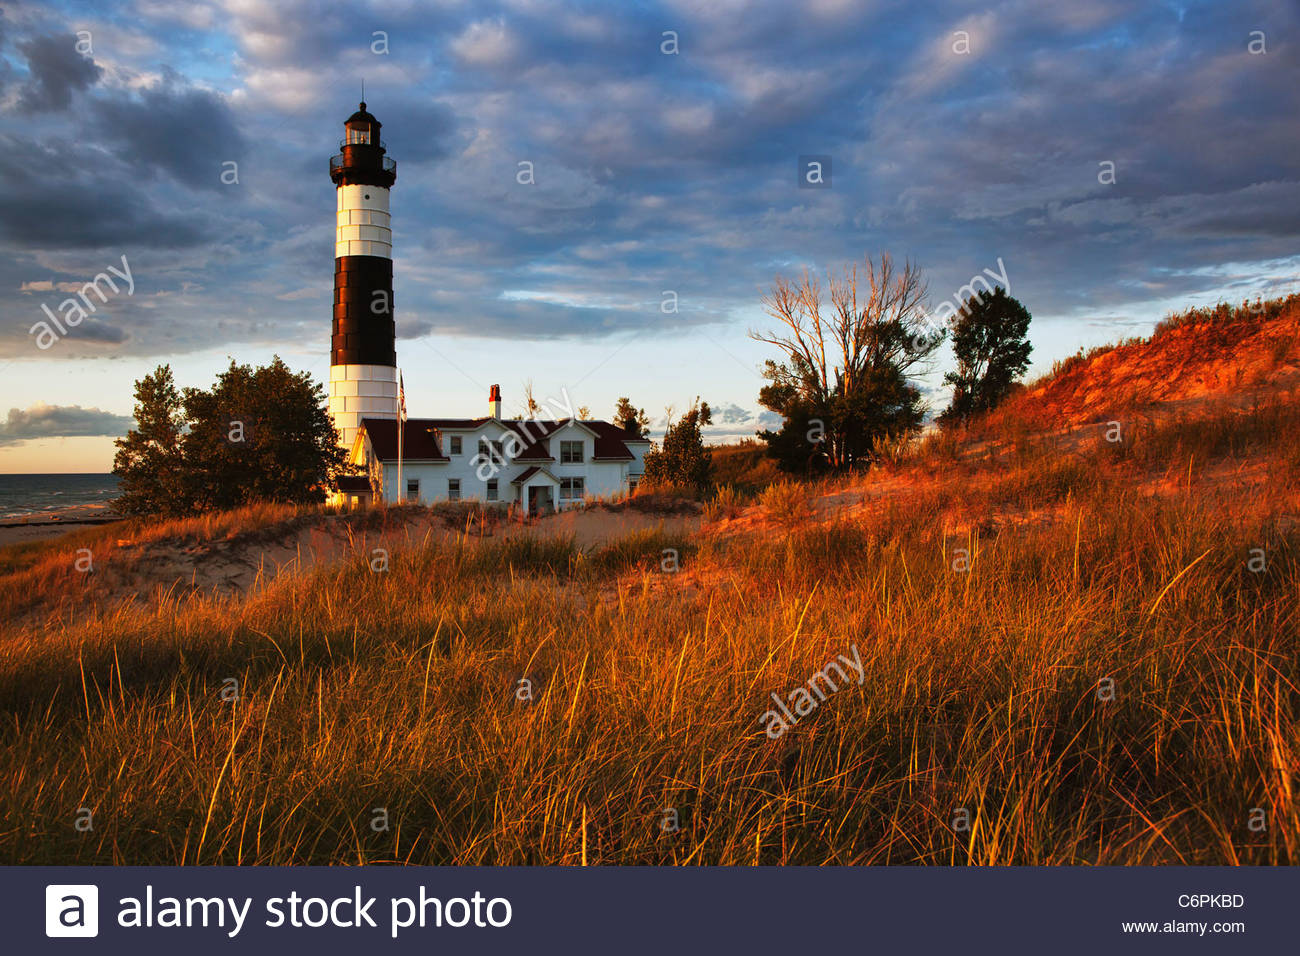 Big Sable Lighthouse at sunset in Ludigton State Park, Ludington, Michigan - Stock Image